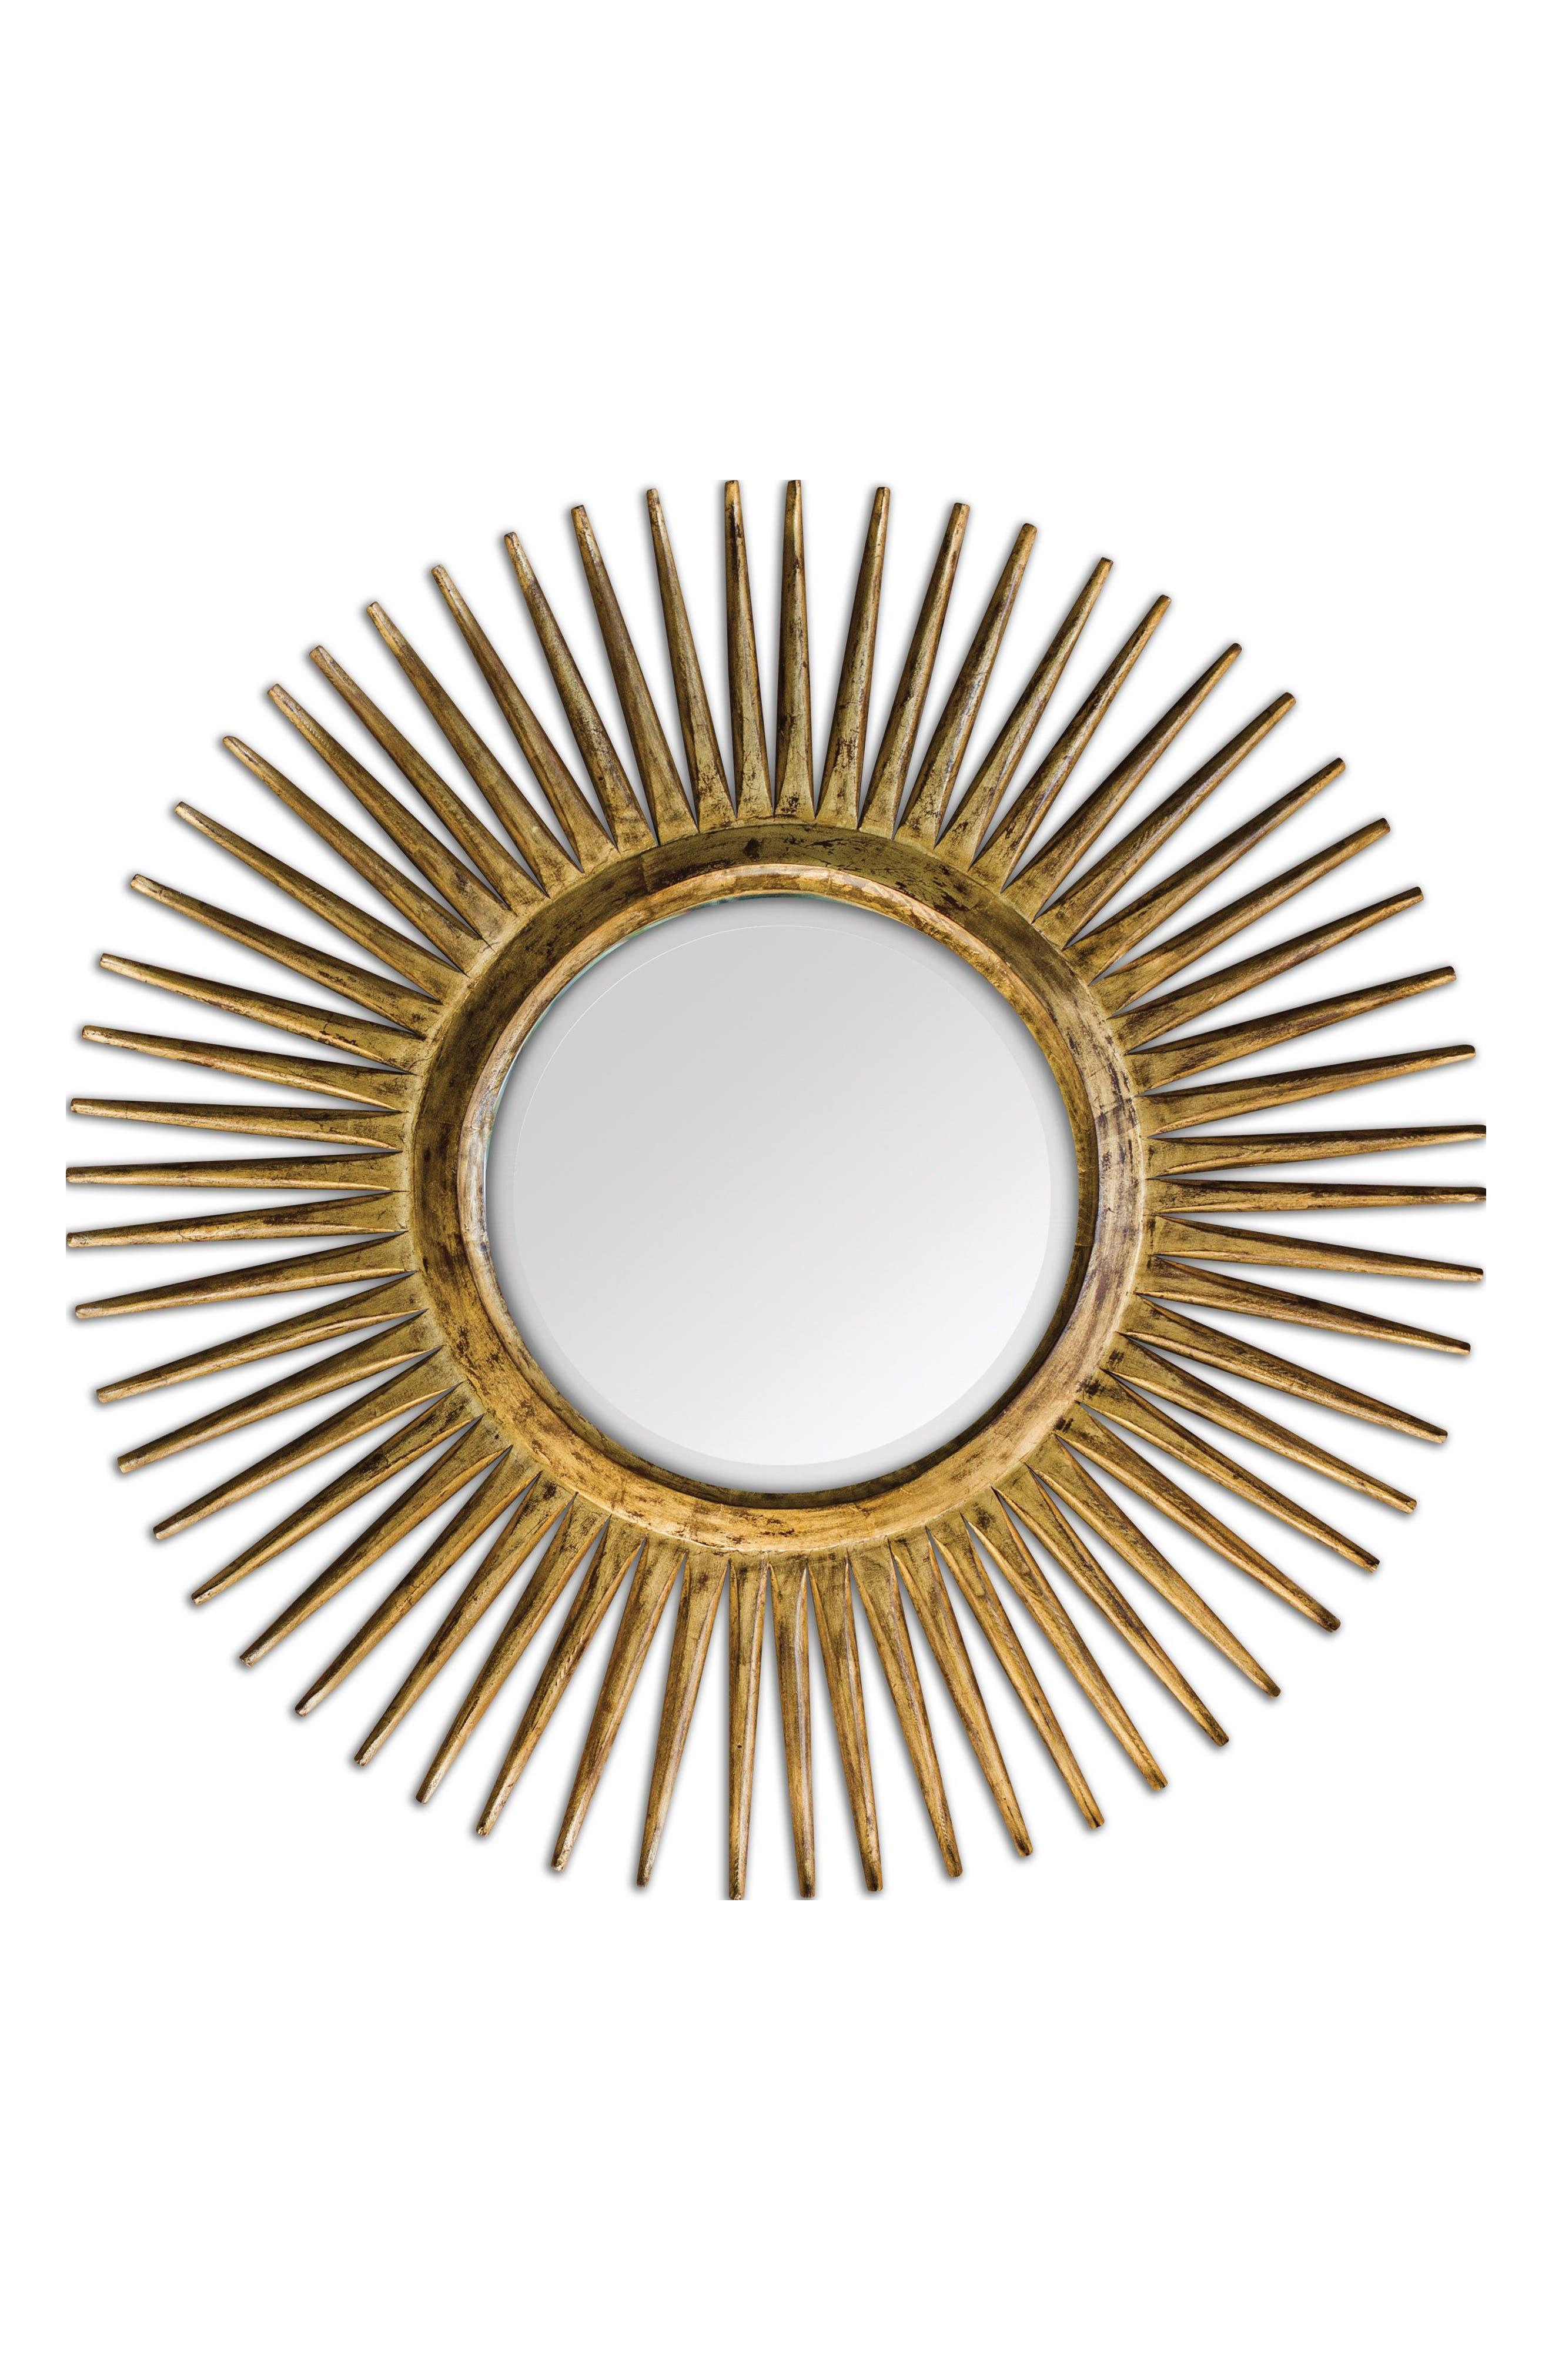 Main Image - Uttermost Destello Wall Mirror